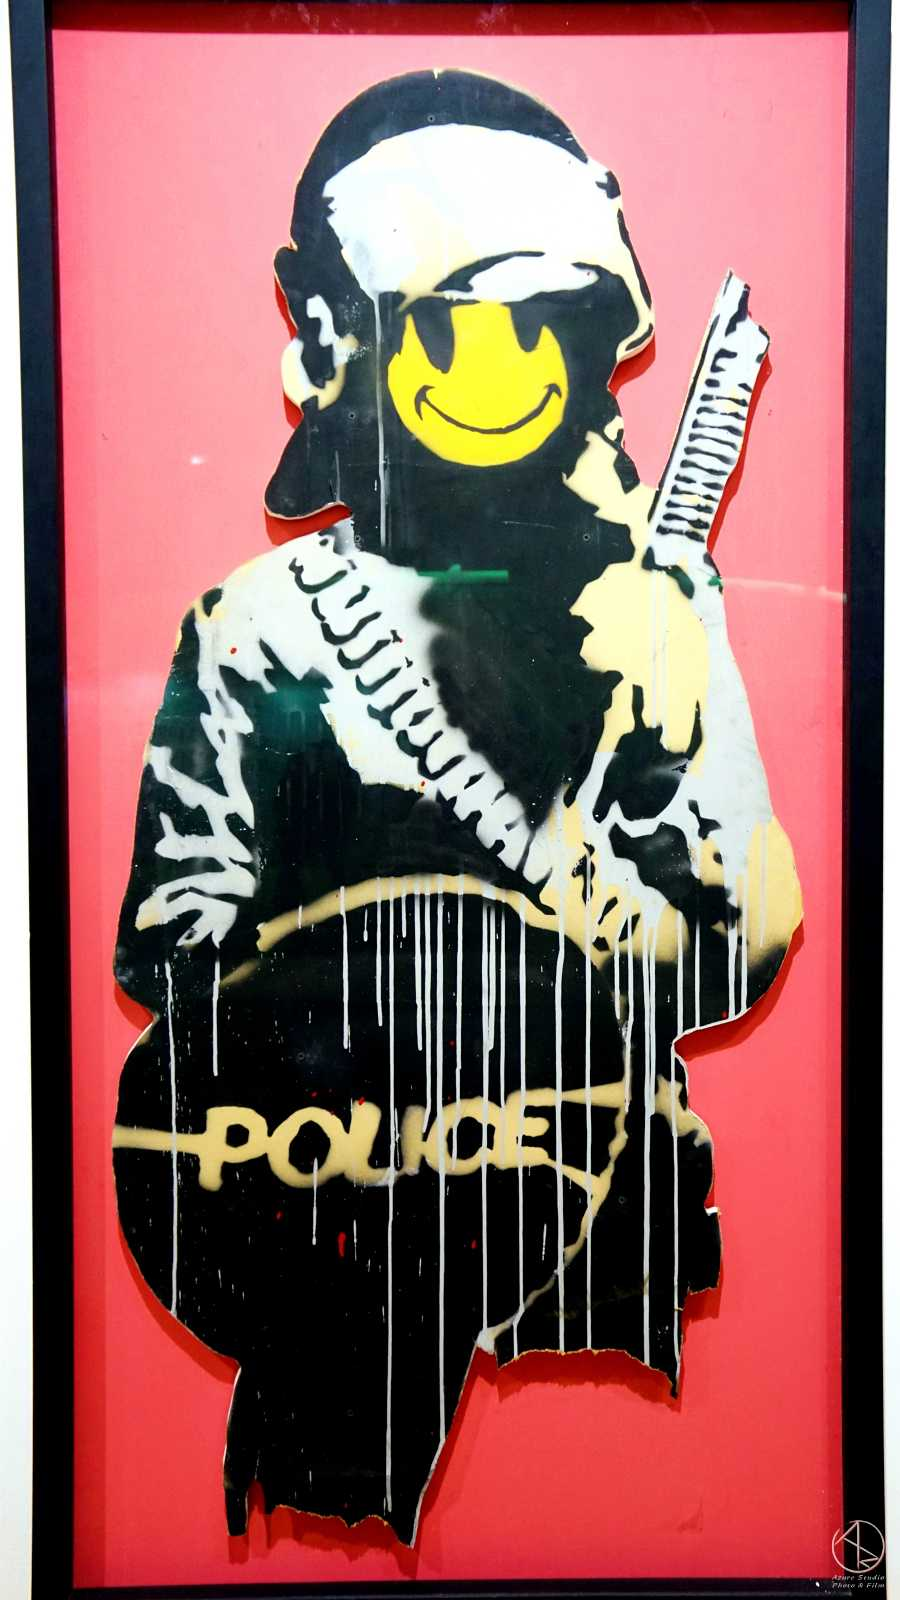 Banksy in Taipei 台北Bellavita班克斯展,微笑的警察。紙板壓克力噴漆,2003年作品。